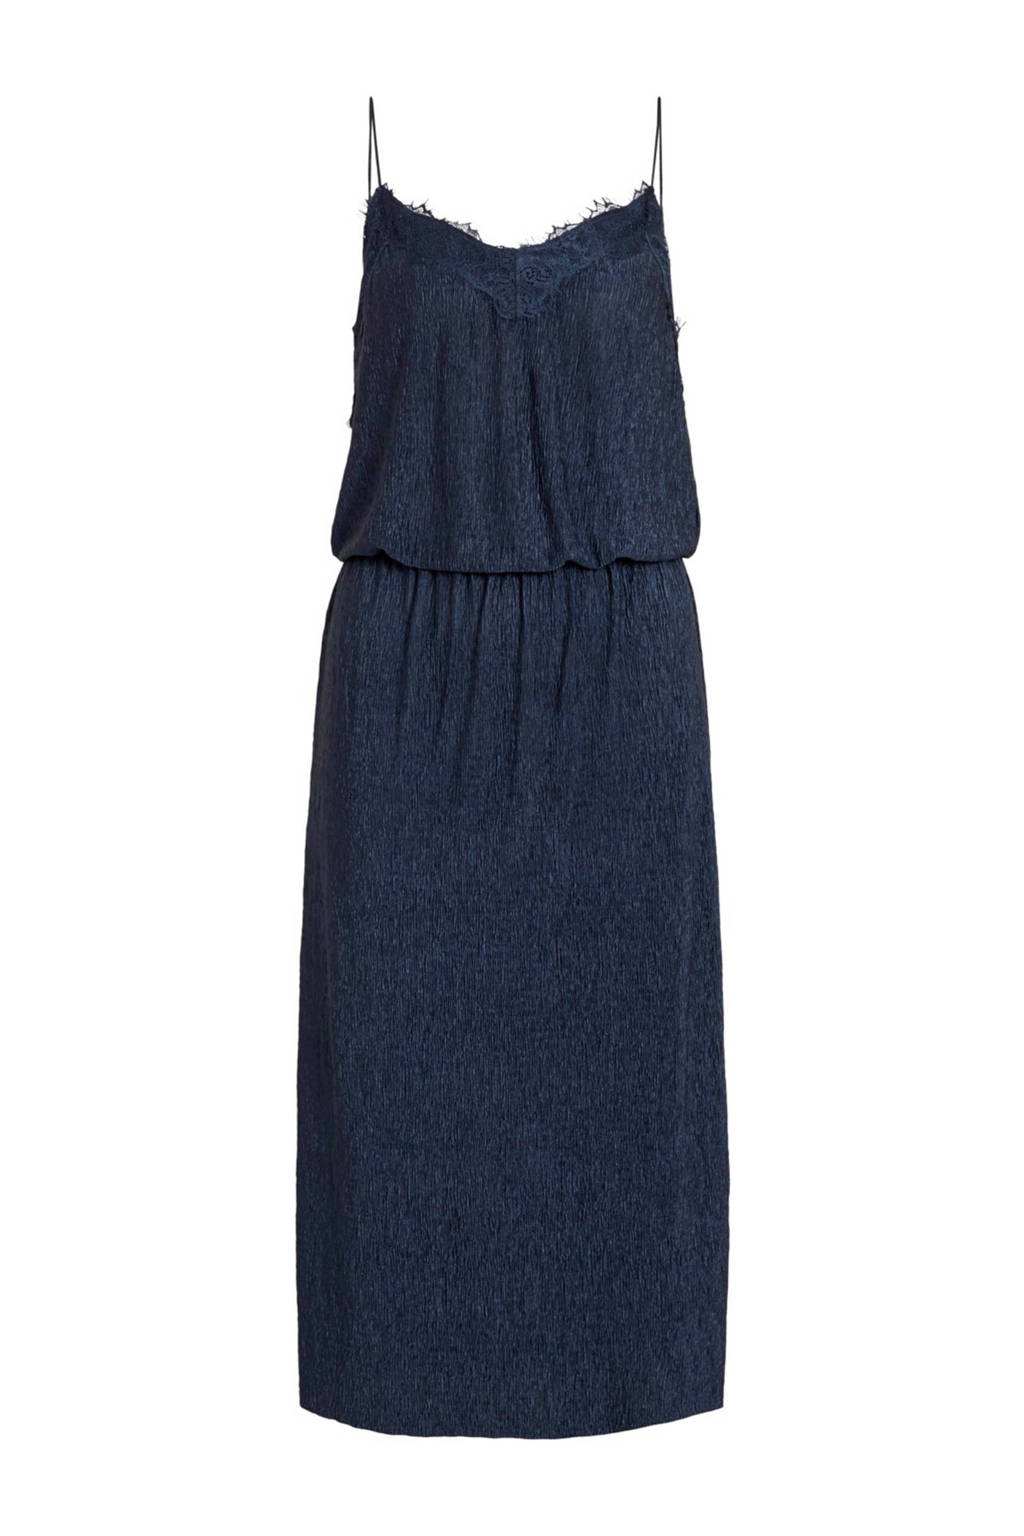 VILA jurk met kant blauw, Blauw